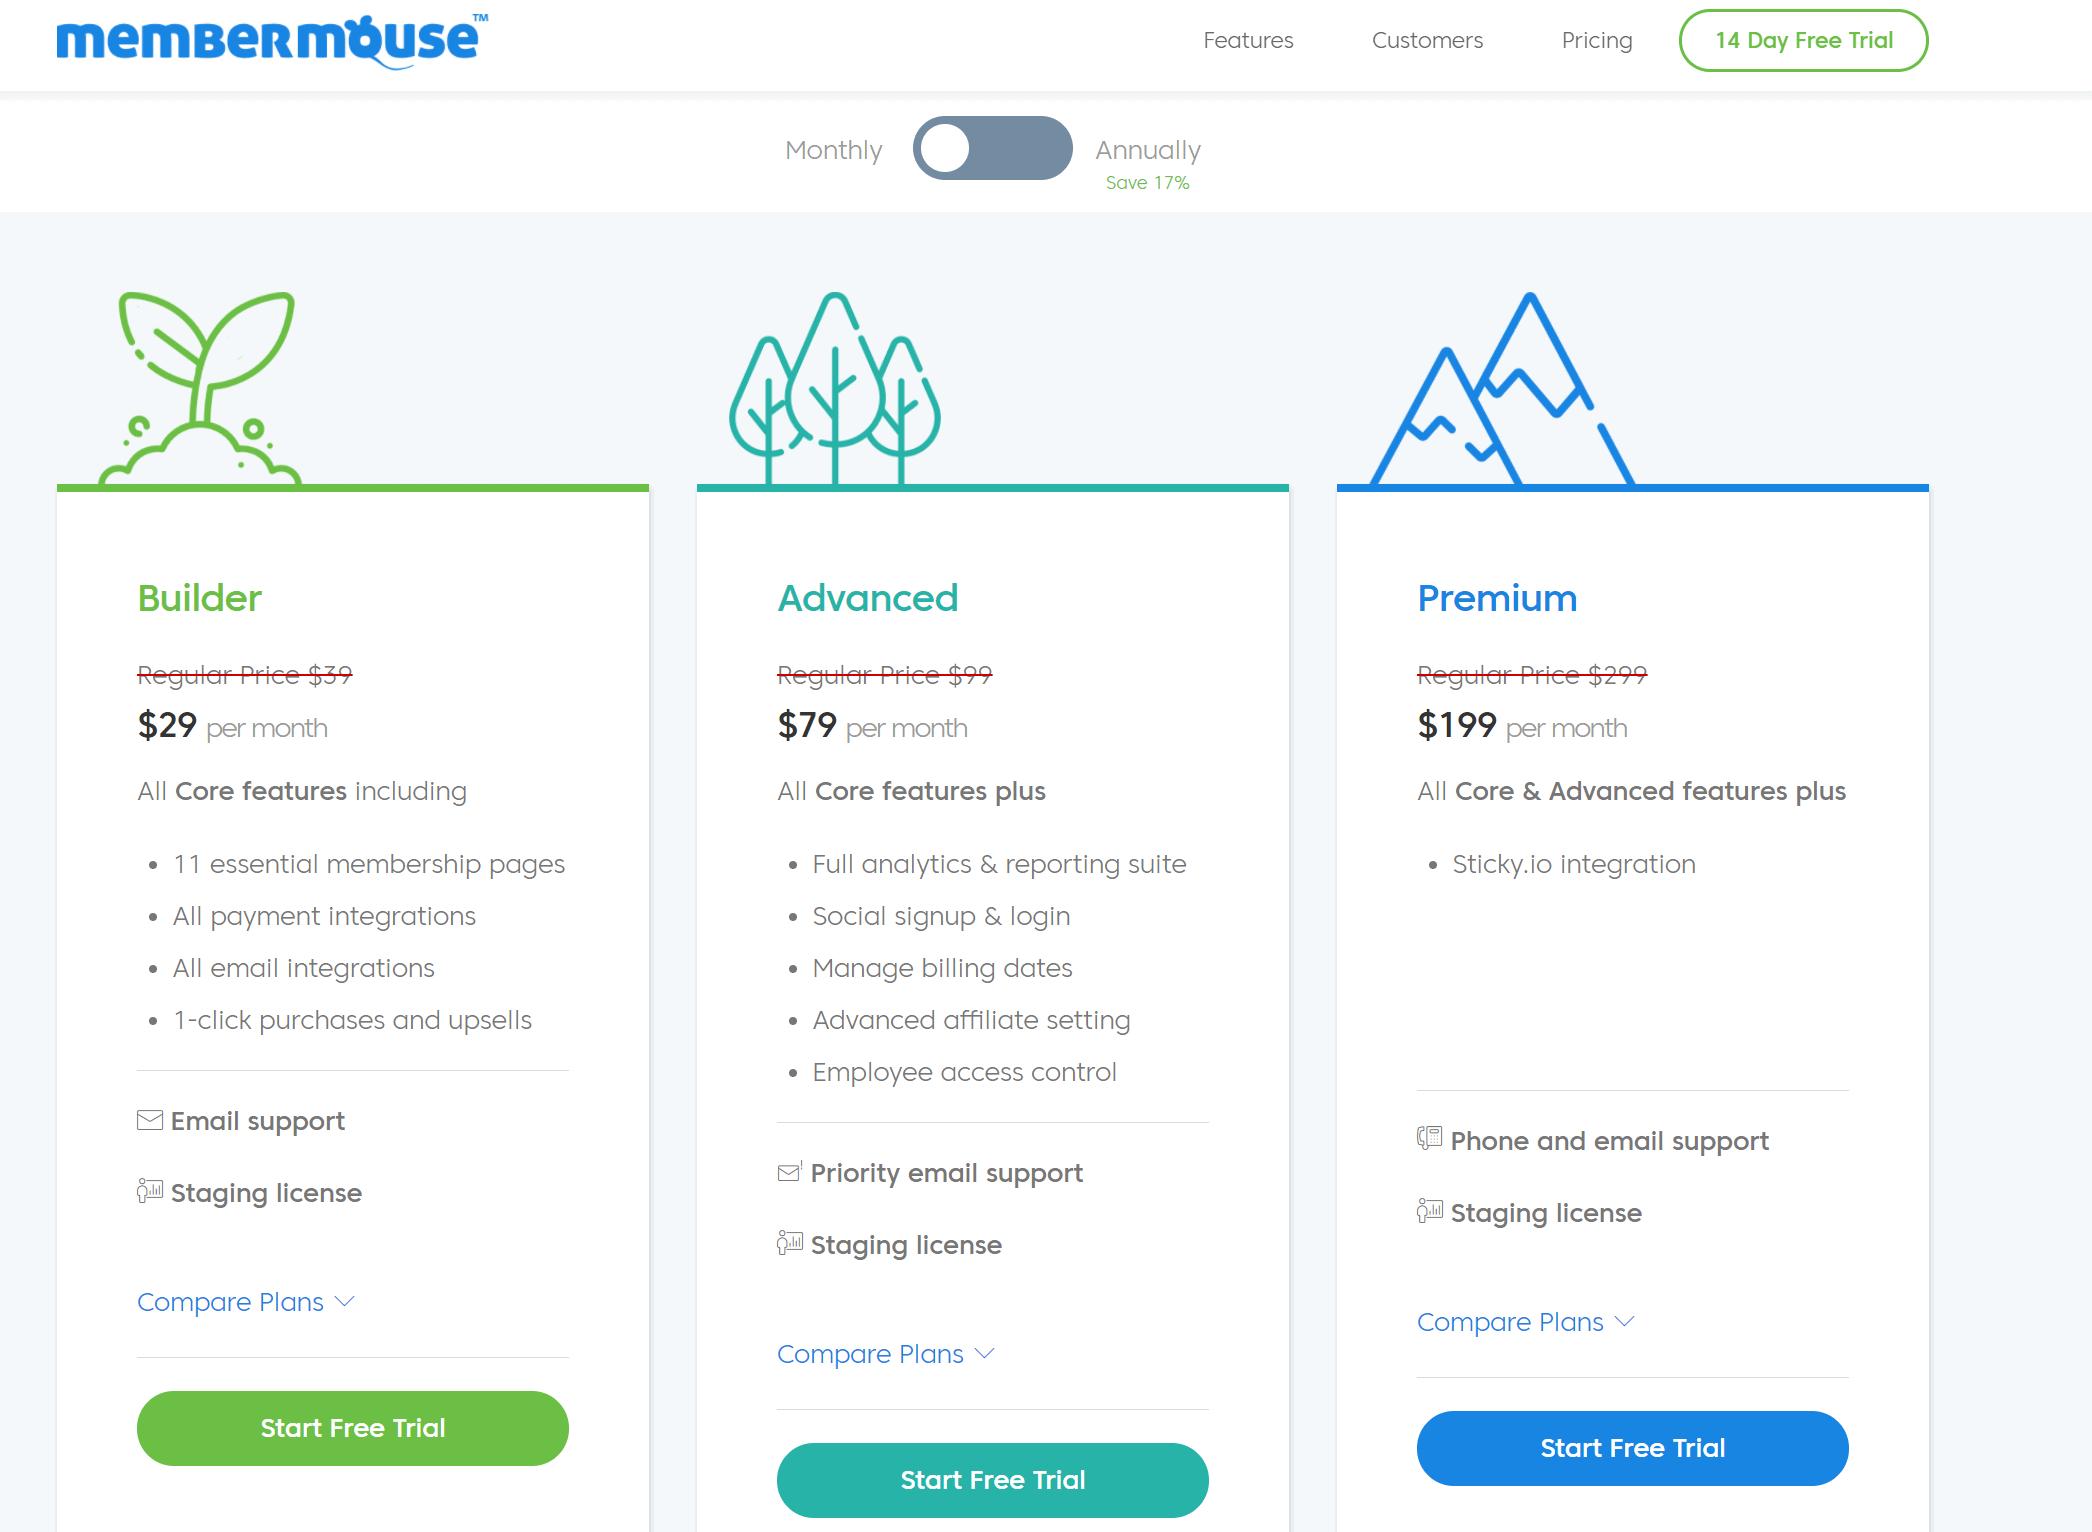 Membermouse pricing